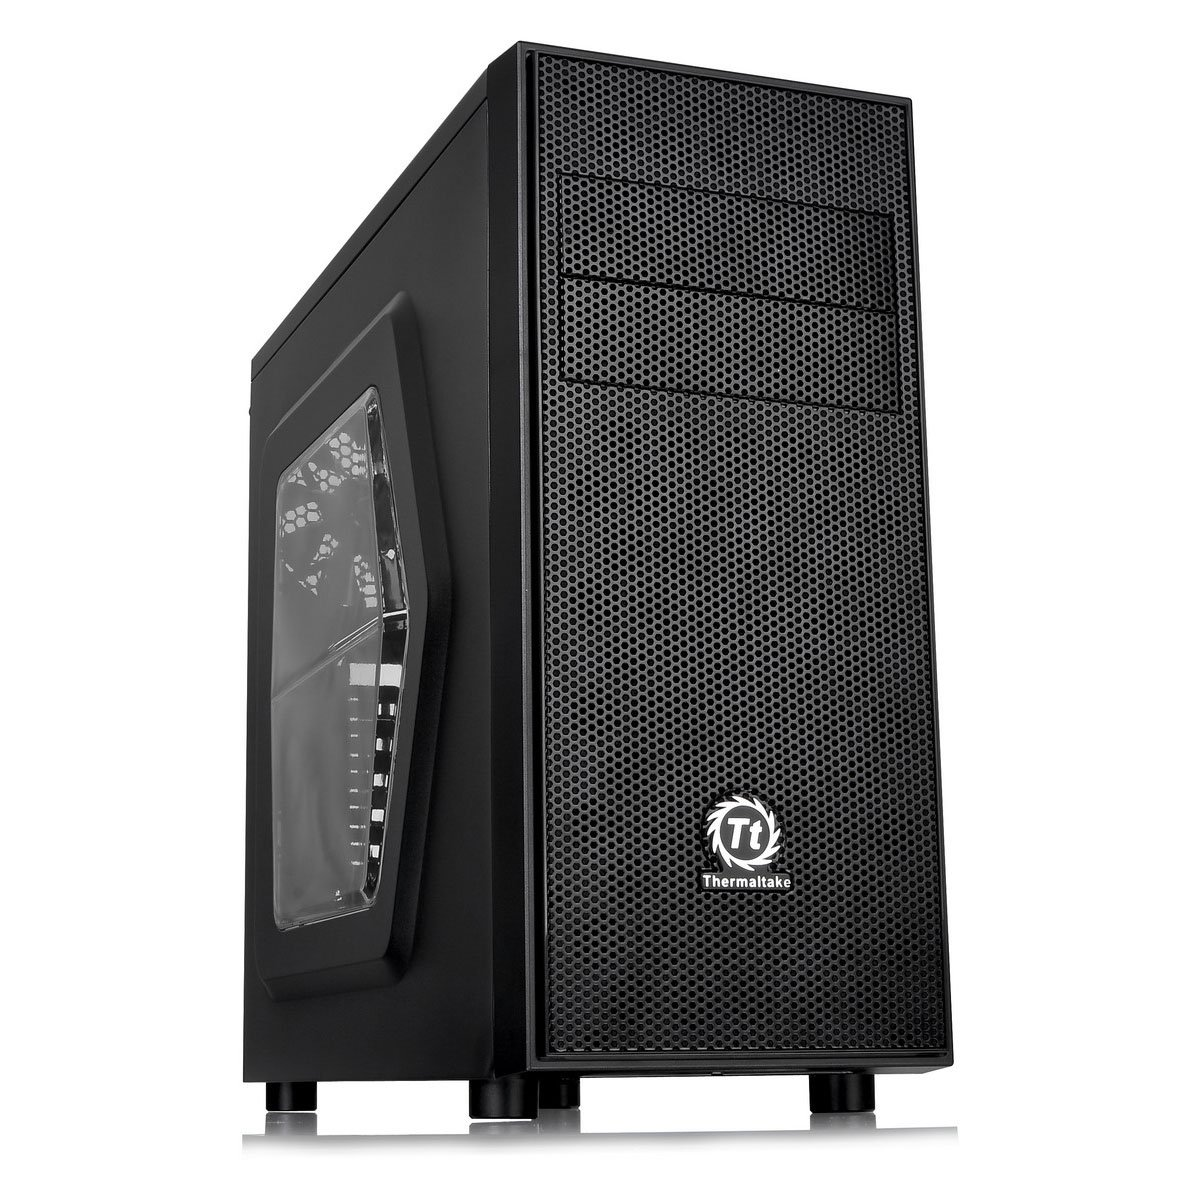 Biostar Hi-Fi A70U3P Realtek LAN Vista